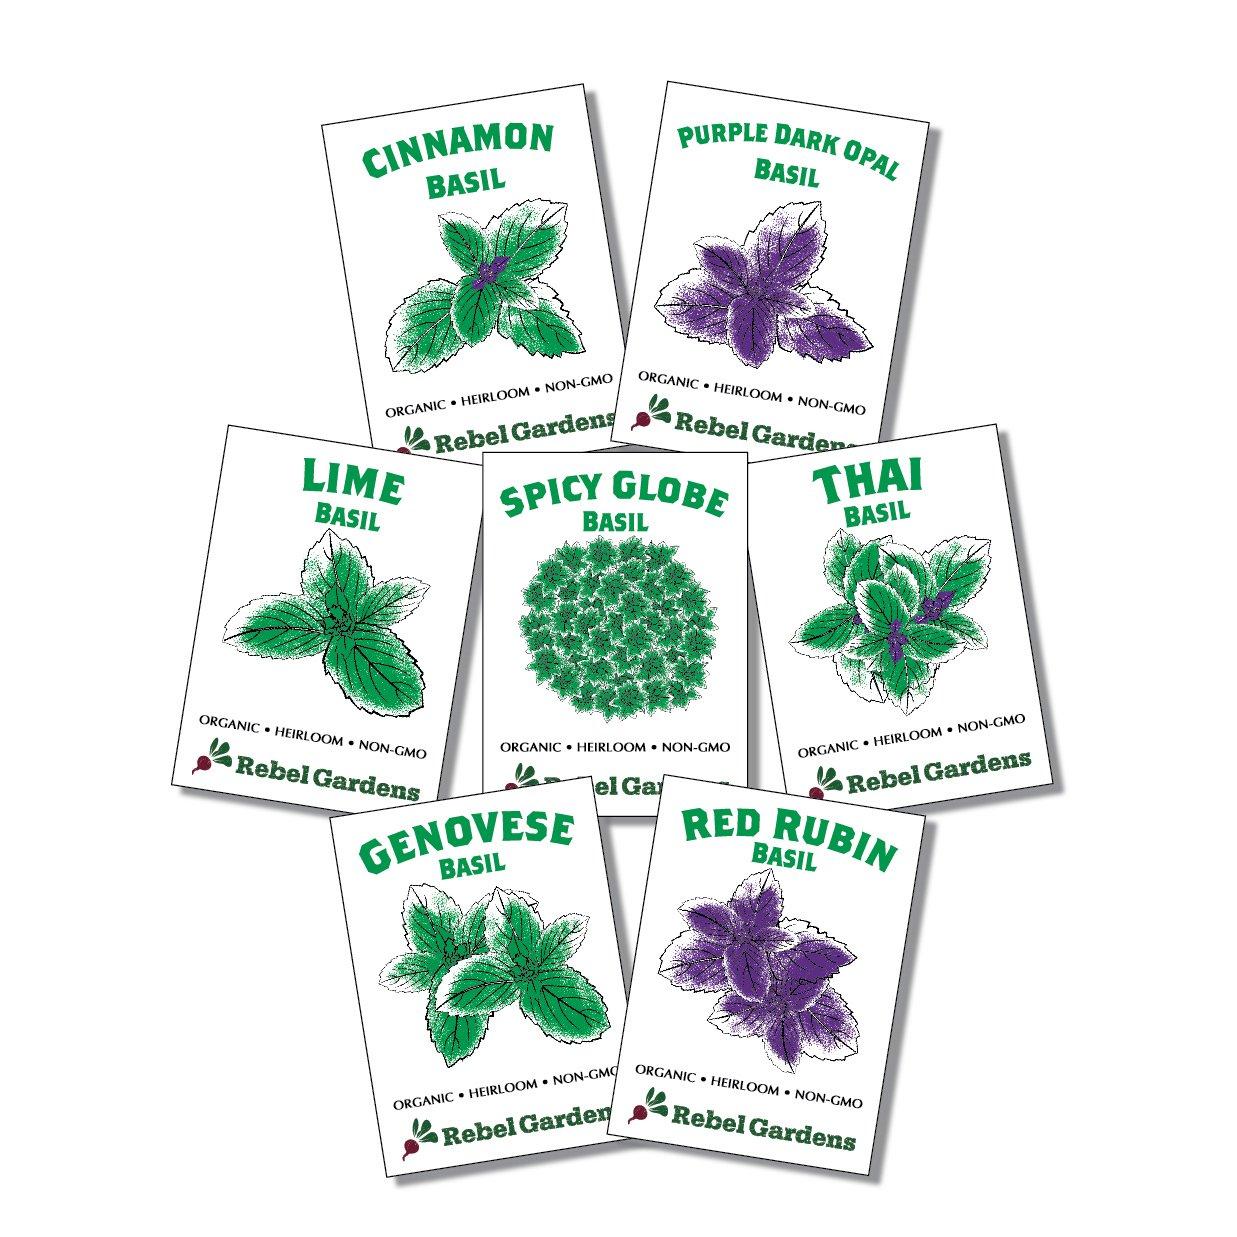 Organic Basil Seeds - Set of 7 Heirloom Non-GMO Seed - Thai, Genovese, Cinnamon, Spicy Globe, Purple Opal, Red Rubin, and Lime